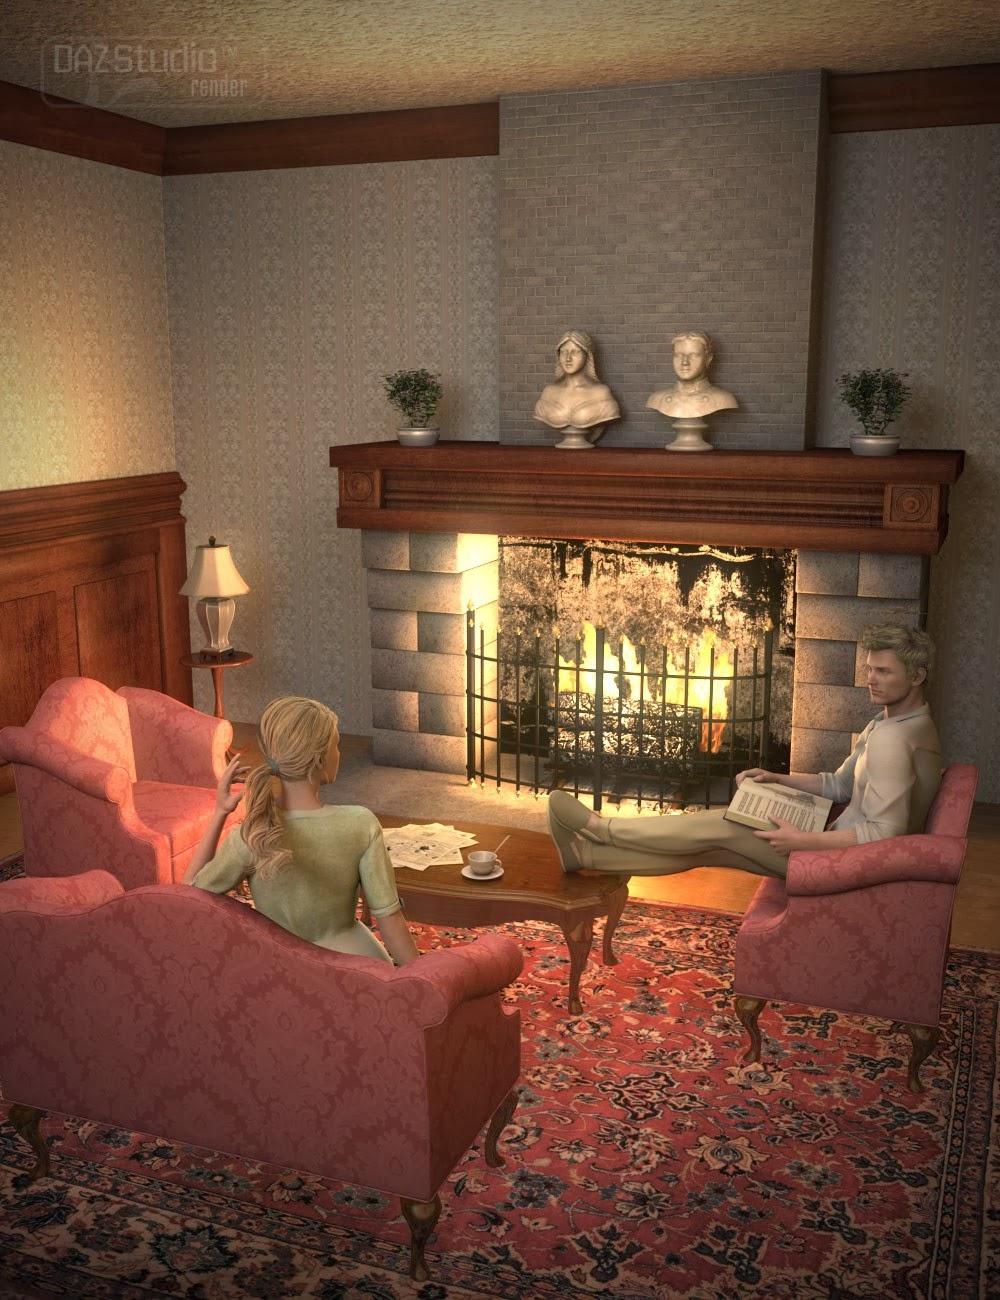 Download DAZ Studio 3 For FREE!: DAZ 3D